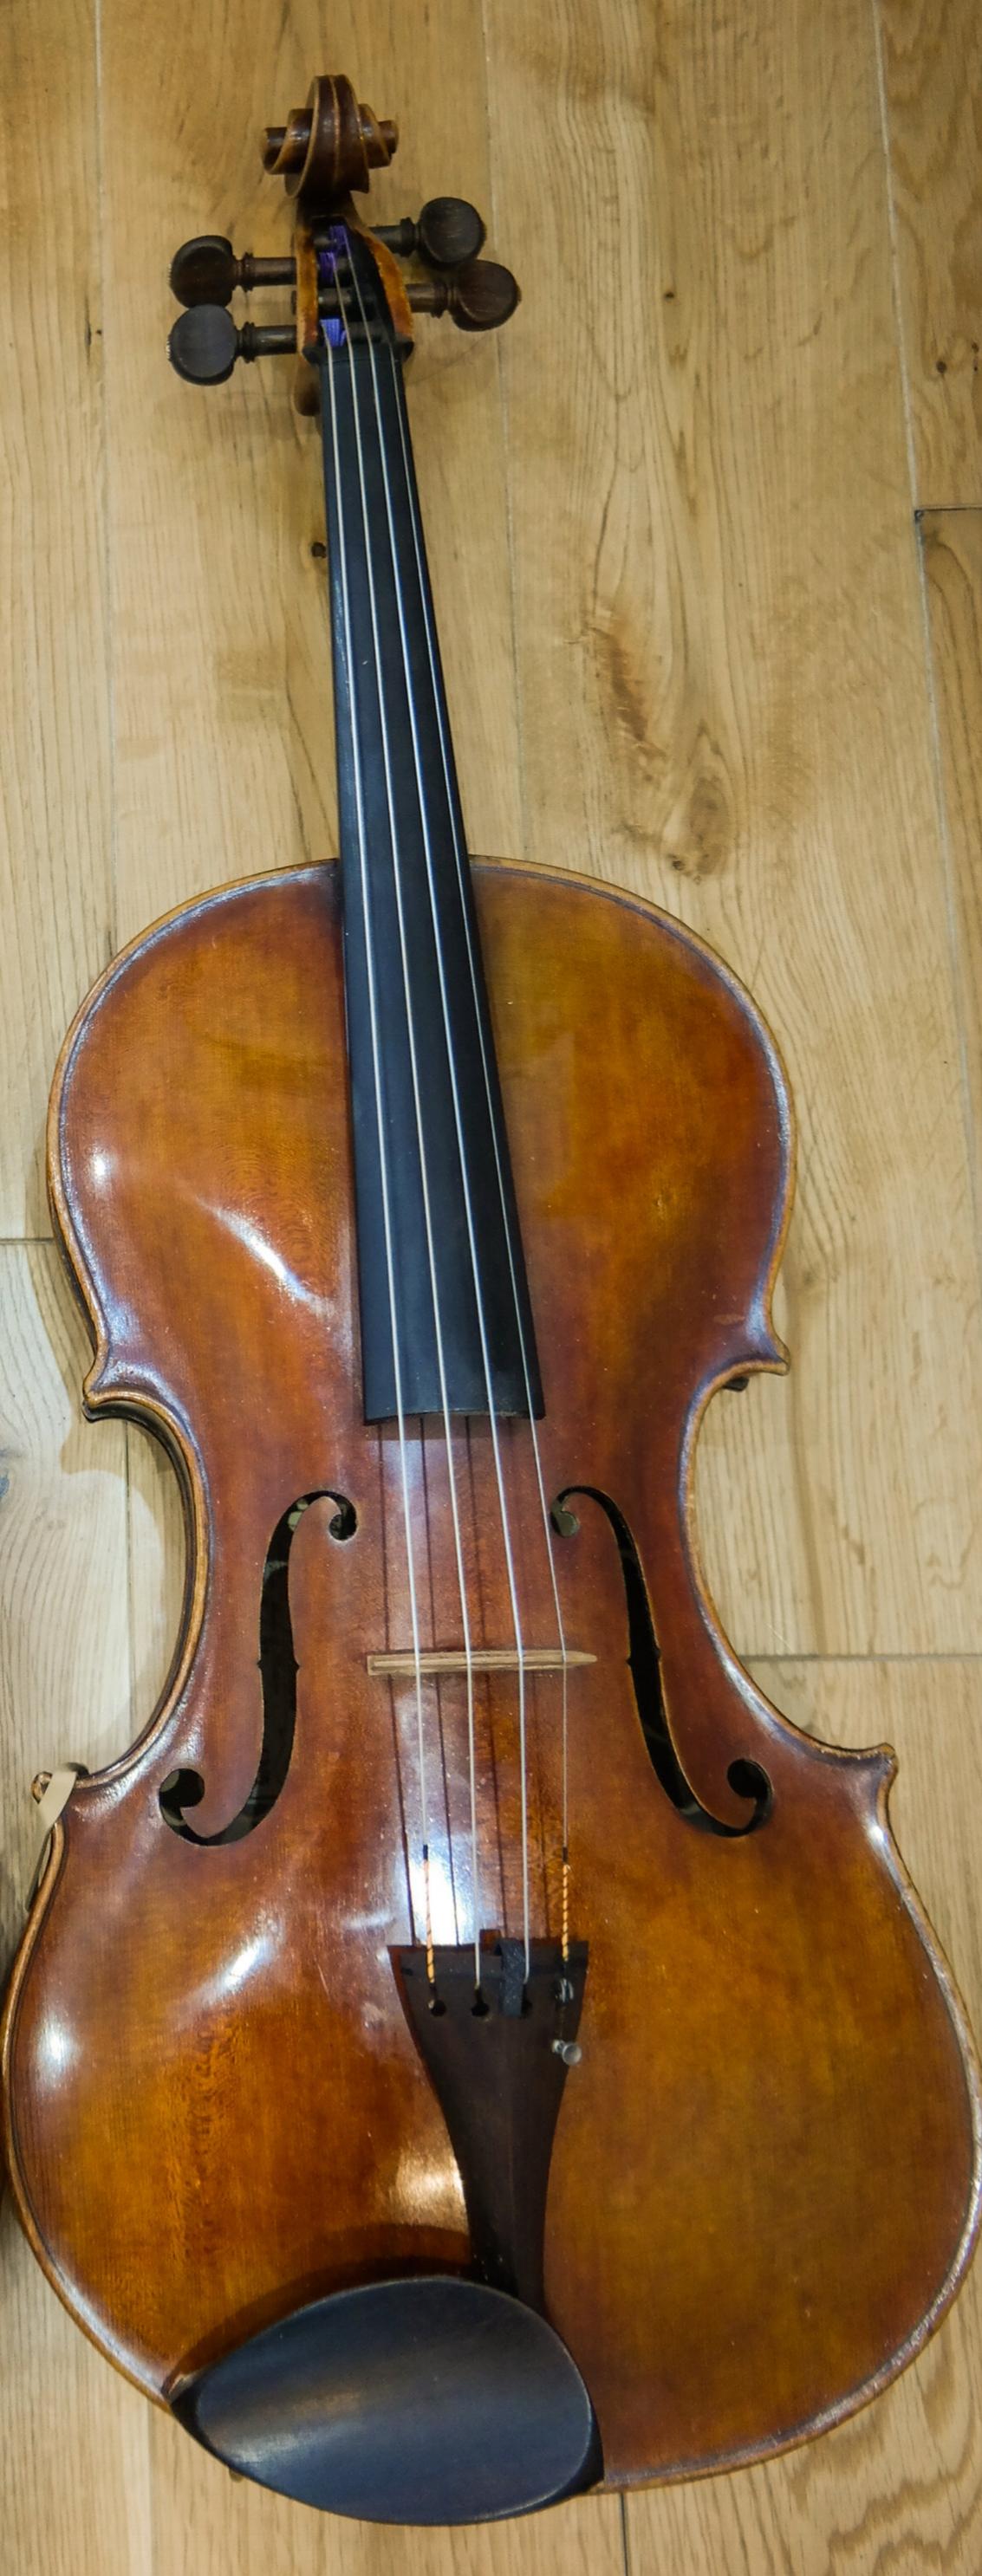 "The Viola itself - a 1995 David Milward instrument, 17"" back length."